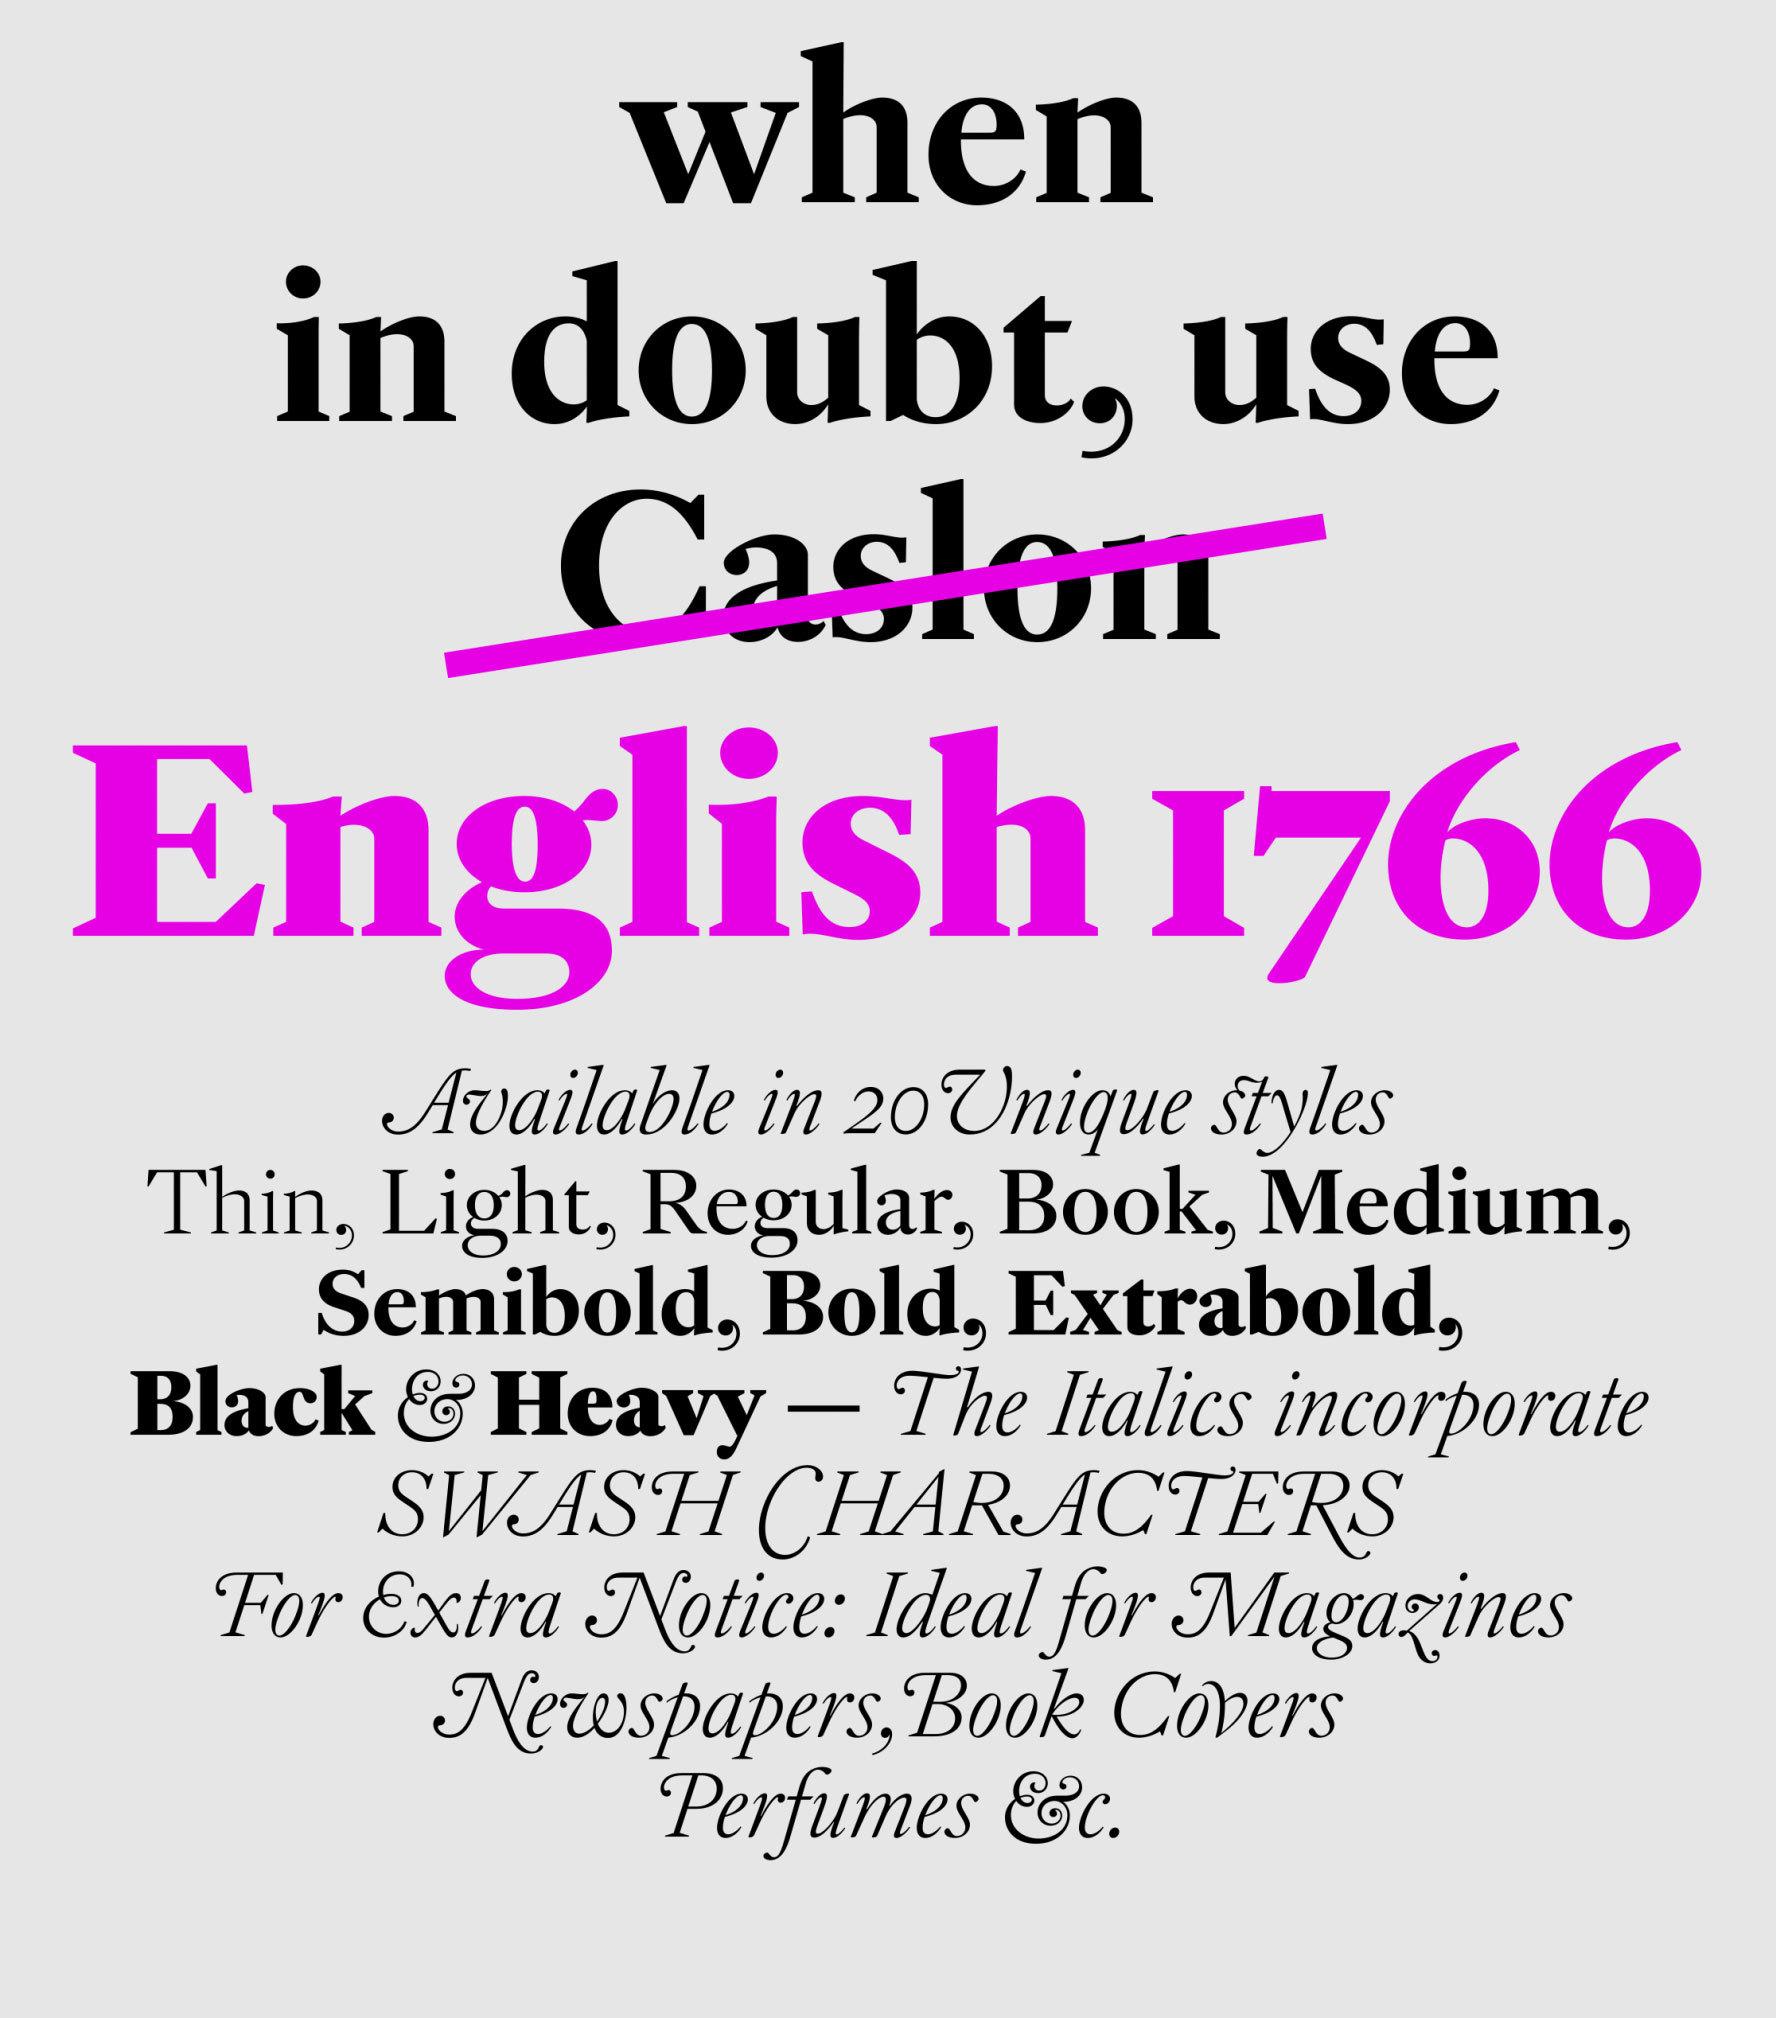 English 1766 sample